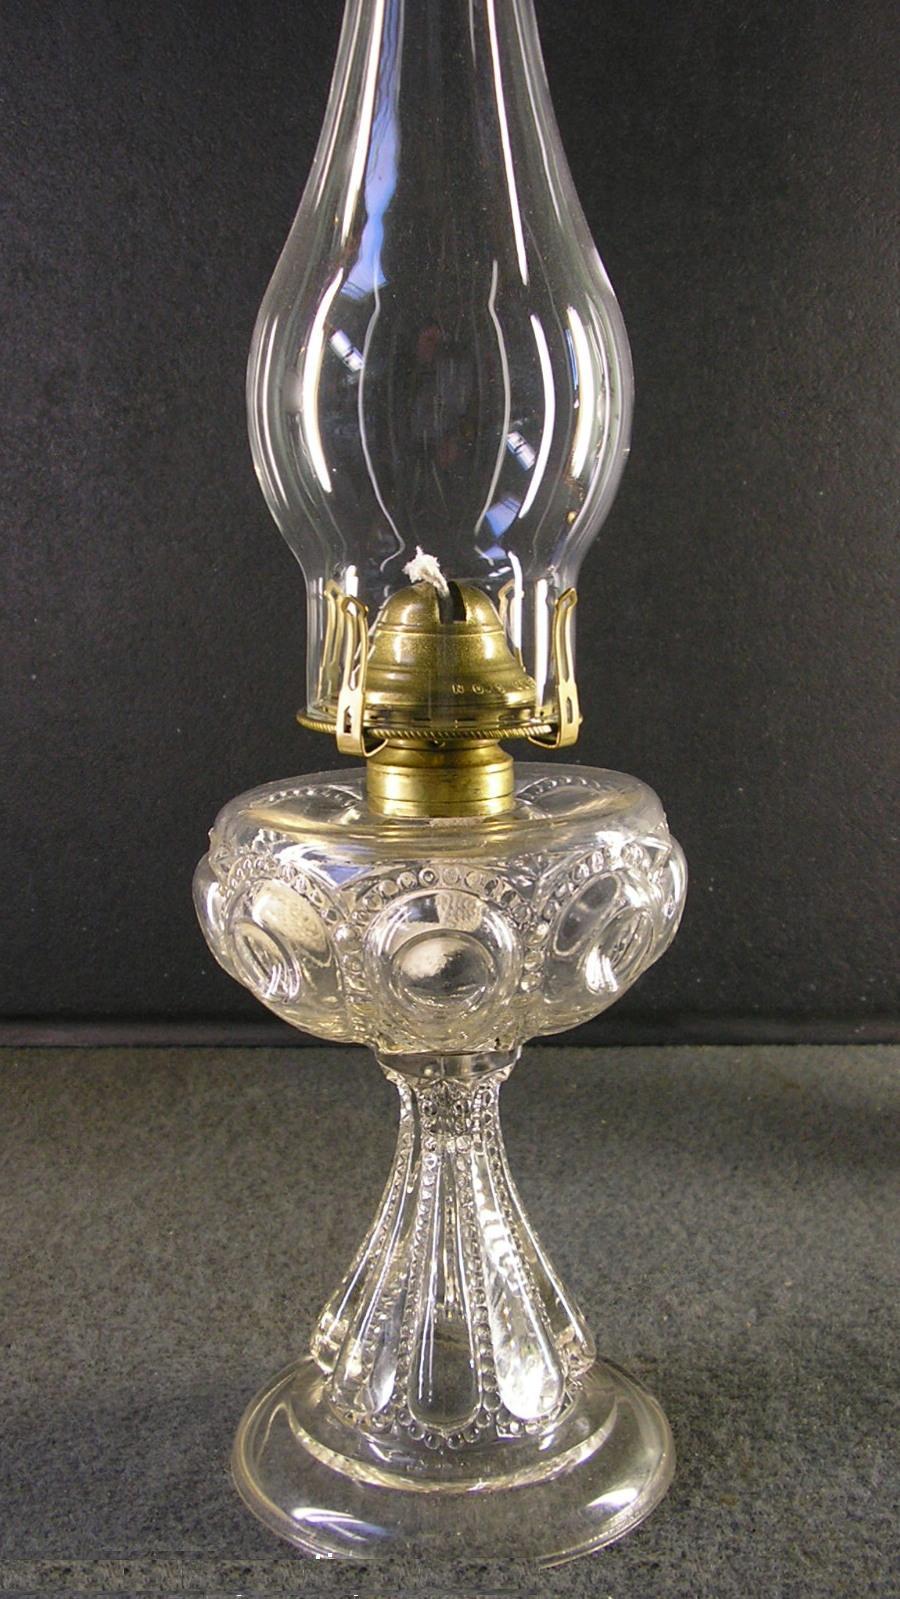 Lamp-Kerosene-Lamp1 Simple and Unique Ideas for Outdoor Lighting